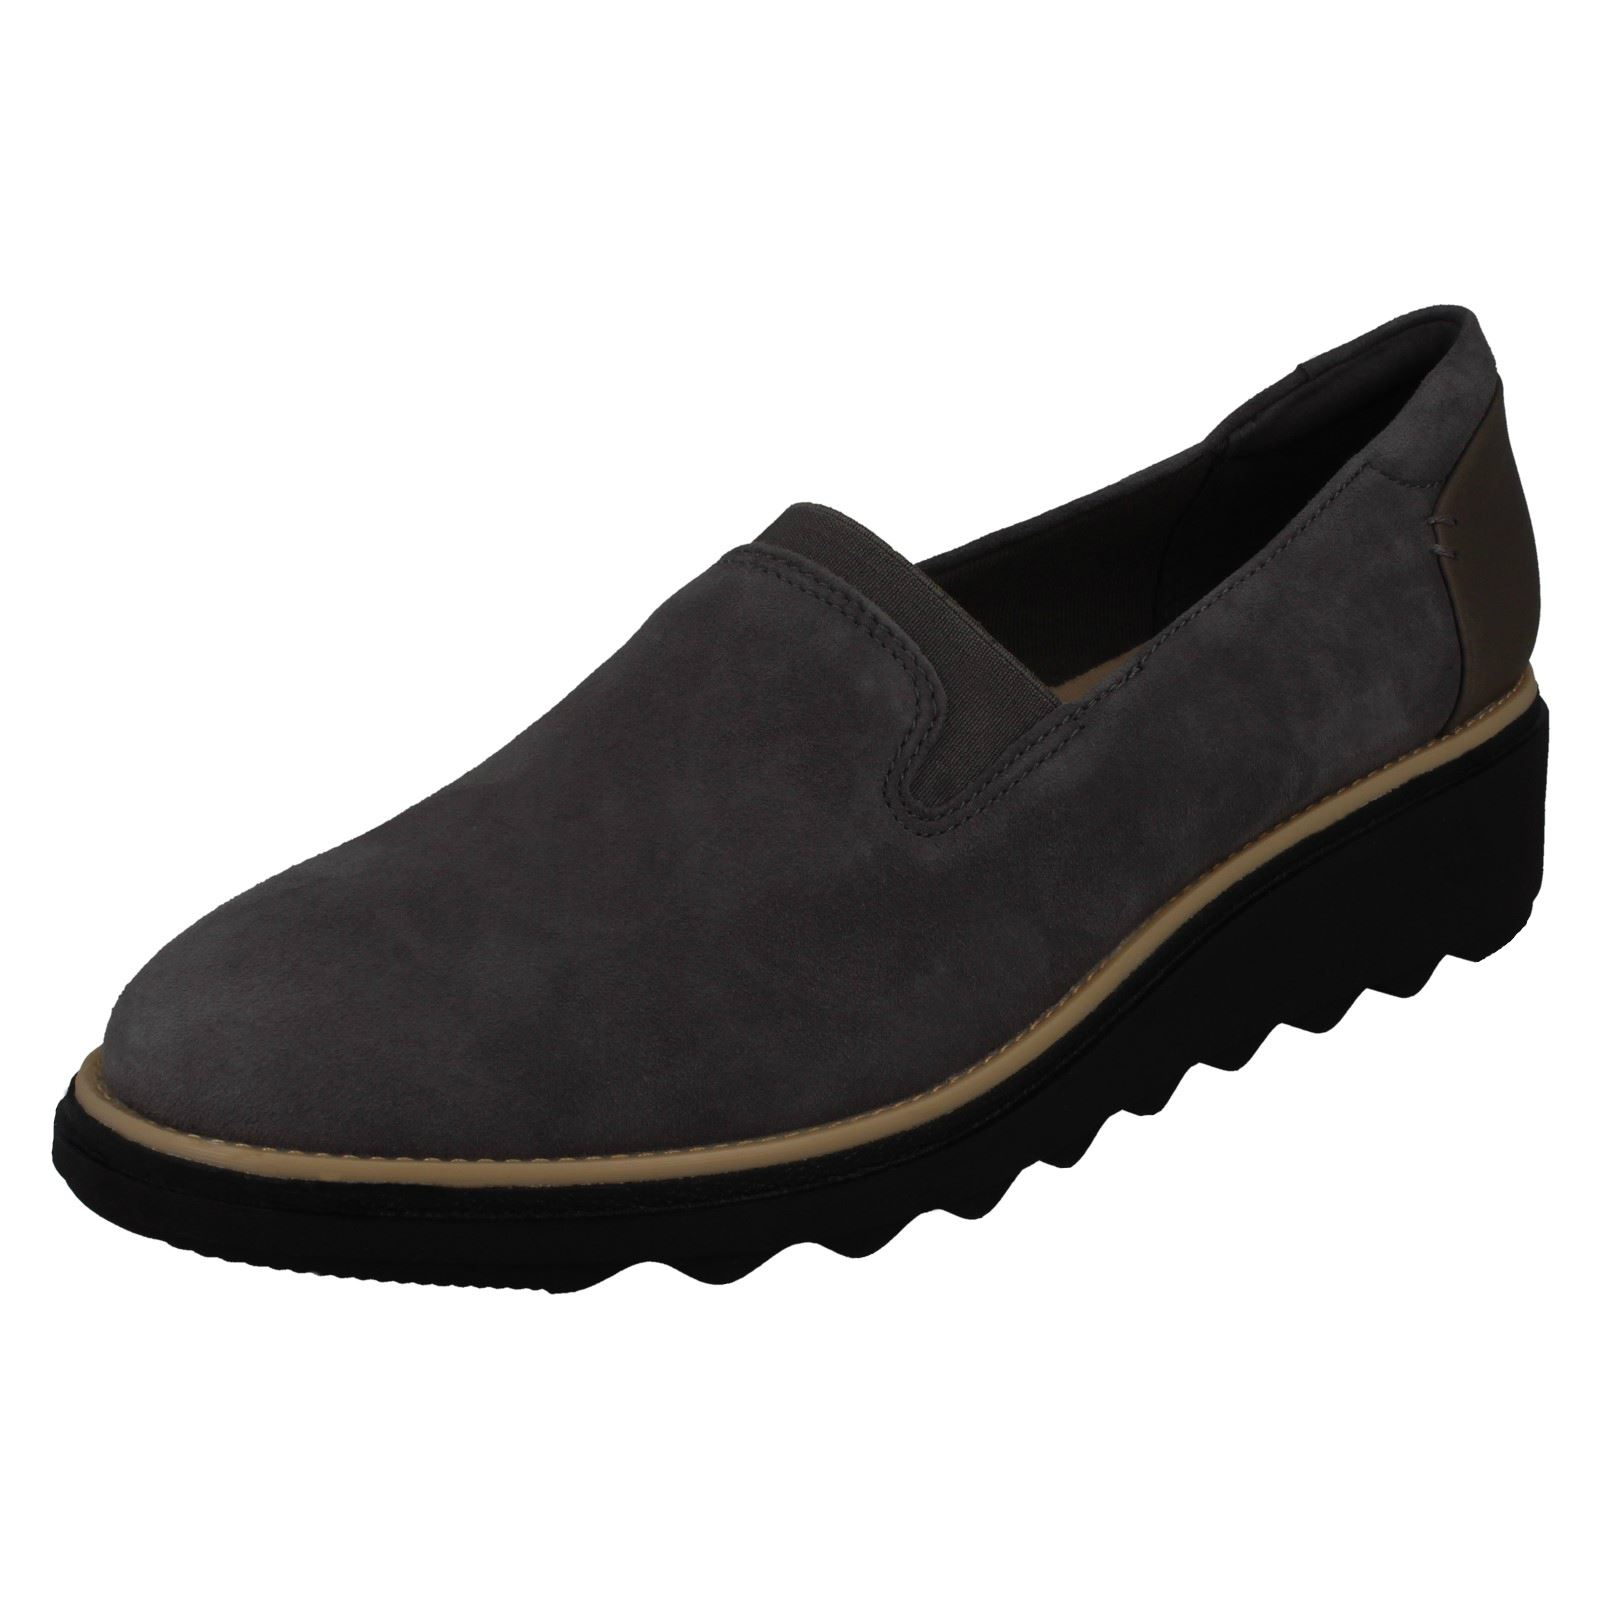 Sin Cordones Mujer Zapatos De Formales Clarks Detalles Muñequita' 'sharon ymwvn0PN8O